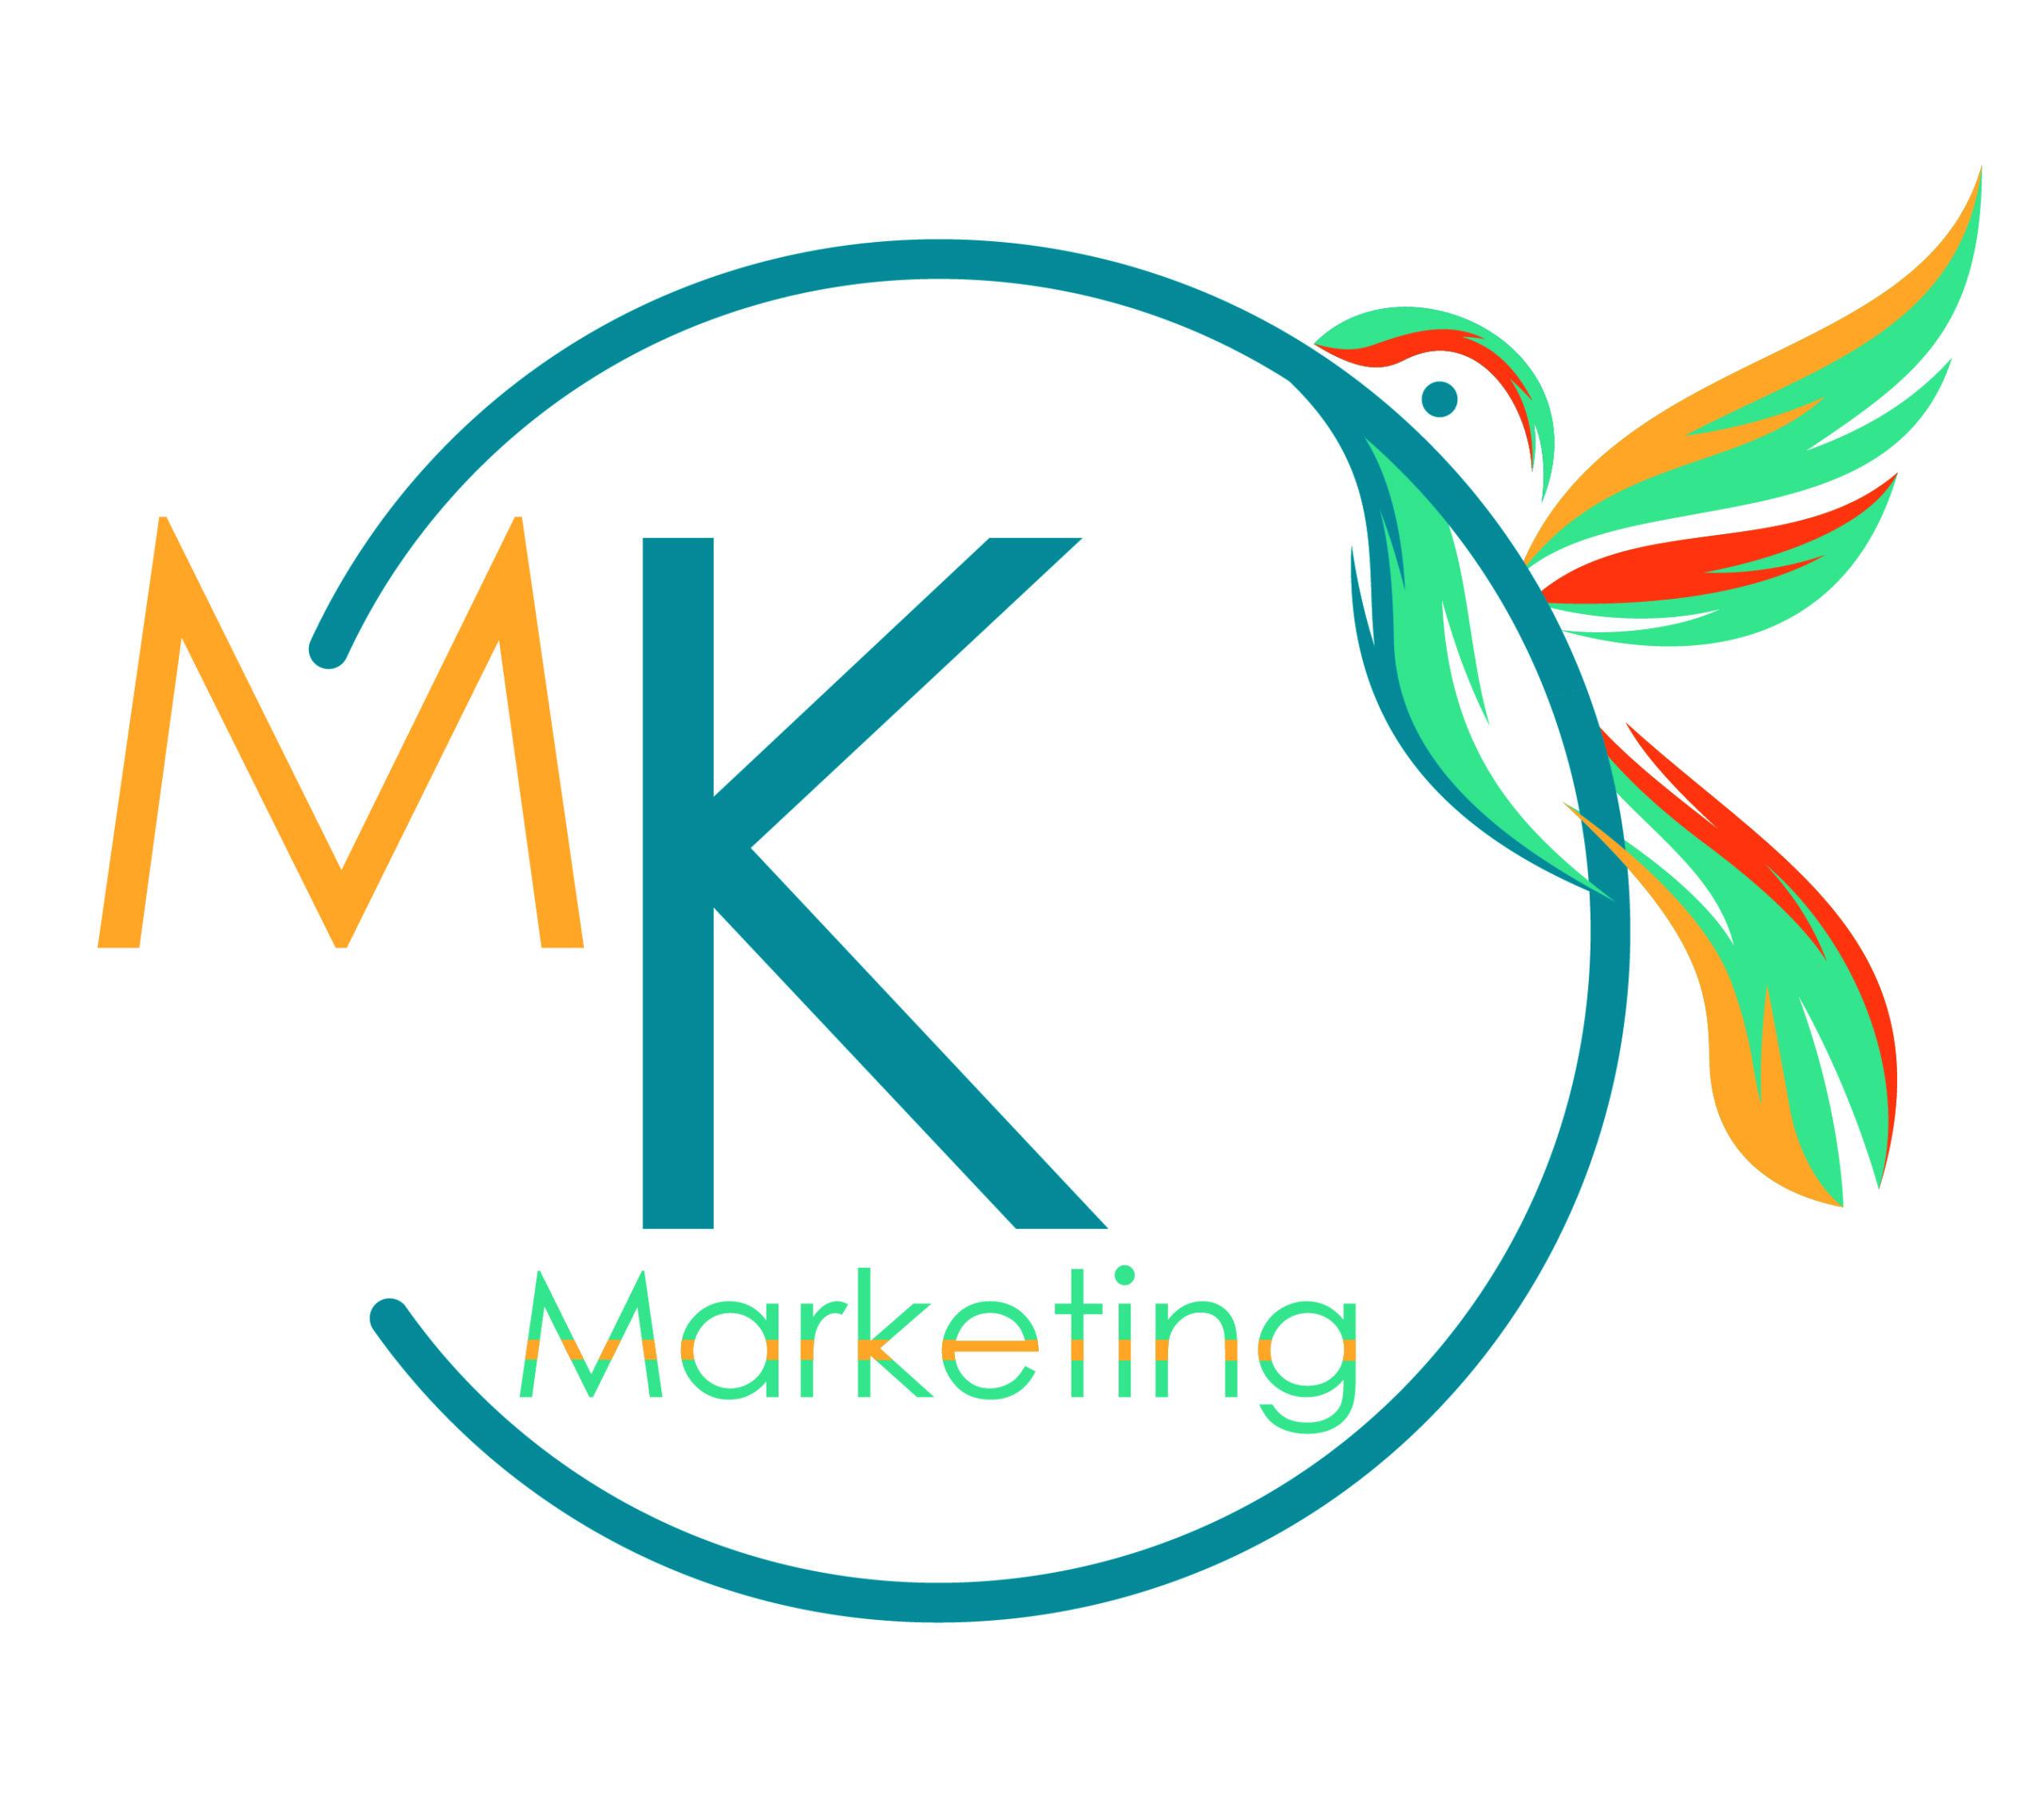 My Konnect Marketing